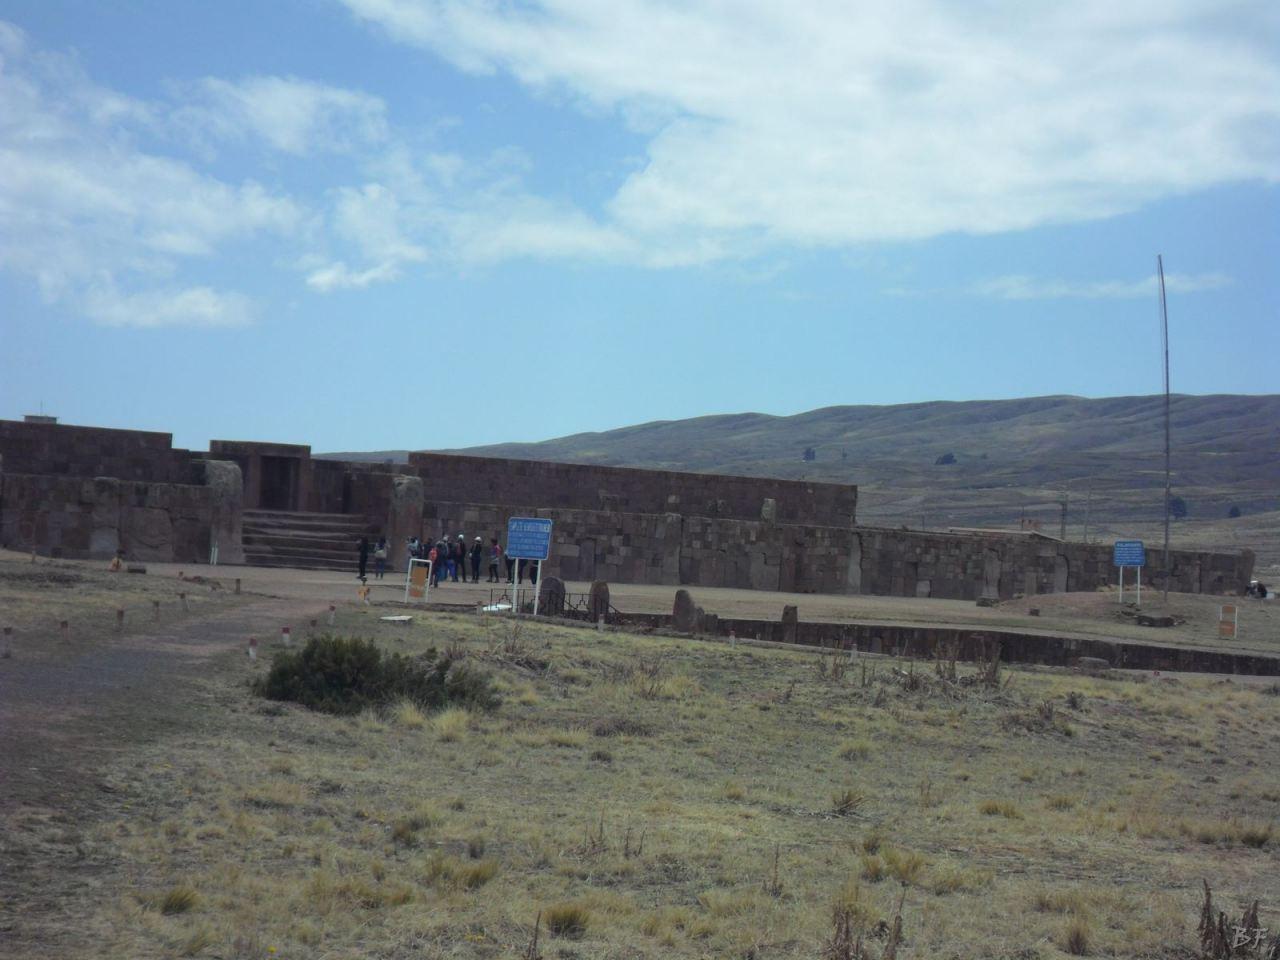 Sito-Megalitico-Piramide-Akapana-Kalasasaya-Menhir-Tiahuanaco-Bolivia-103